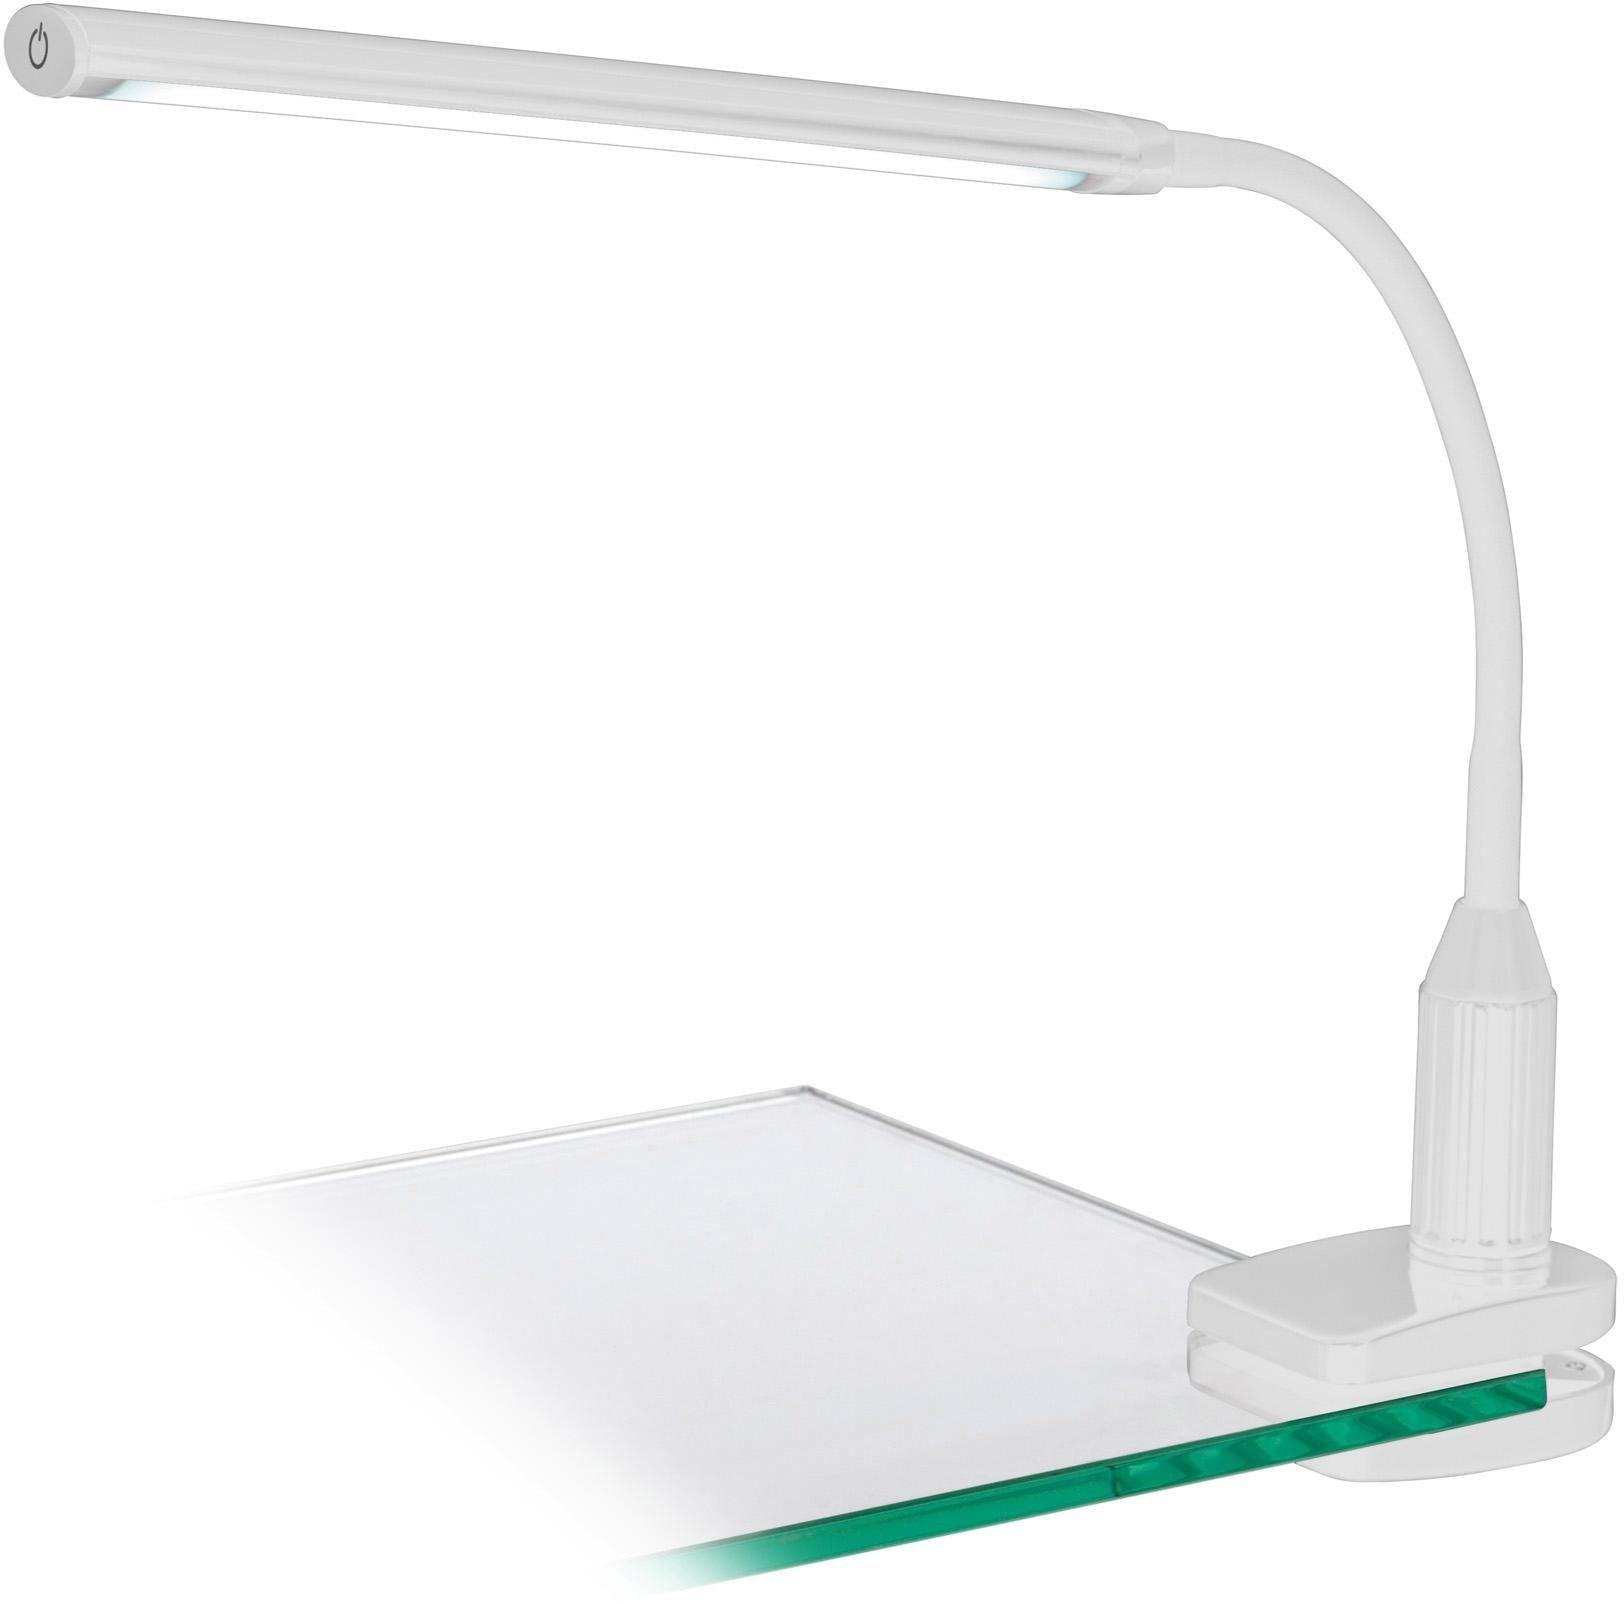 EGLOKlemmleuchteLAROA Wohnen/Accessoires & Leuchten/Lampen & Leuchten/Leselampen